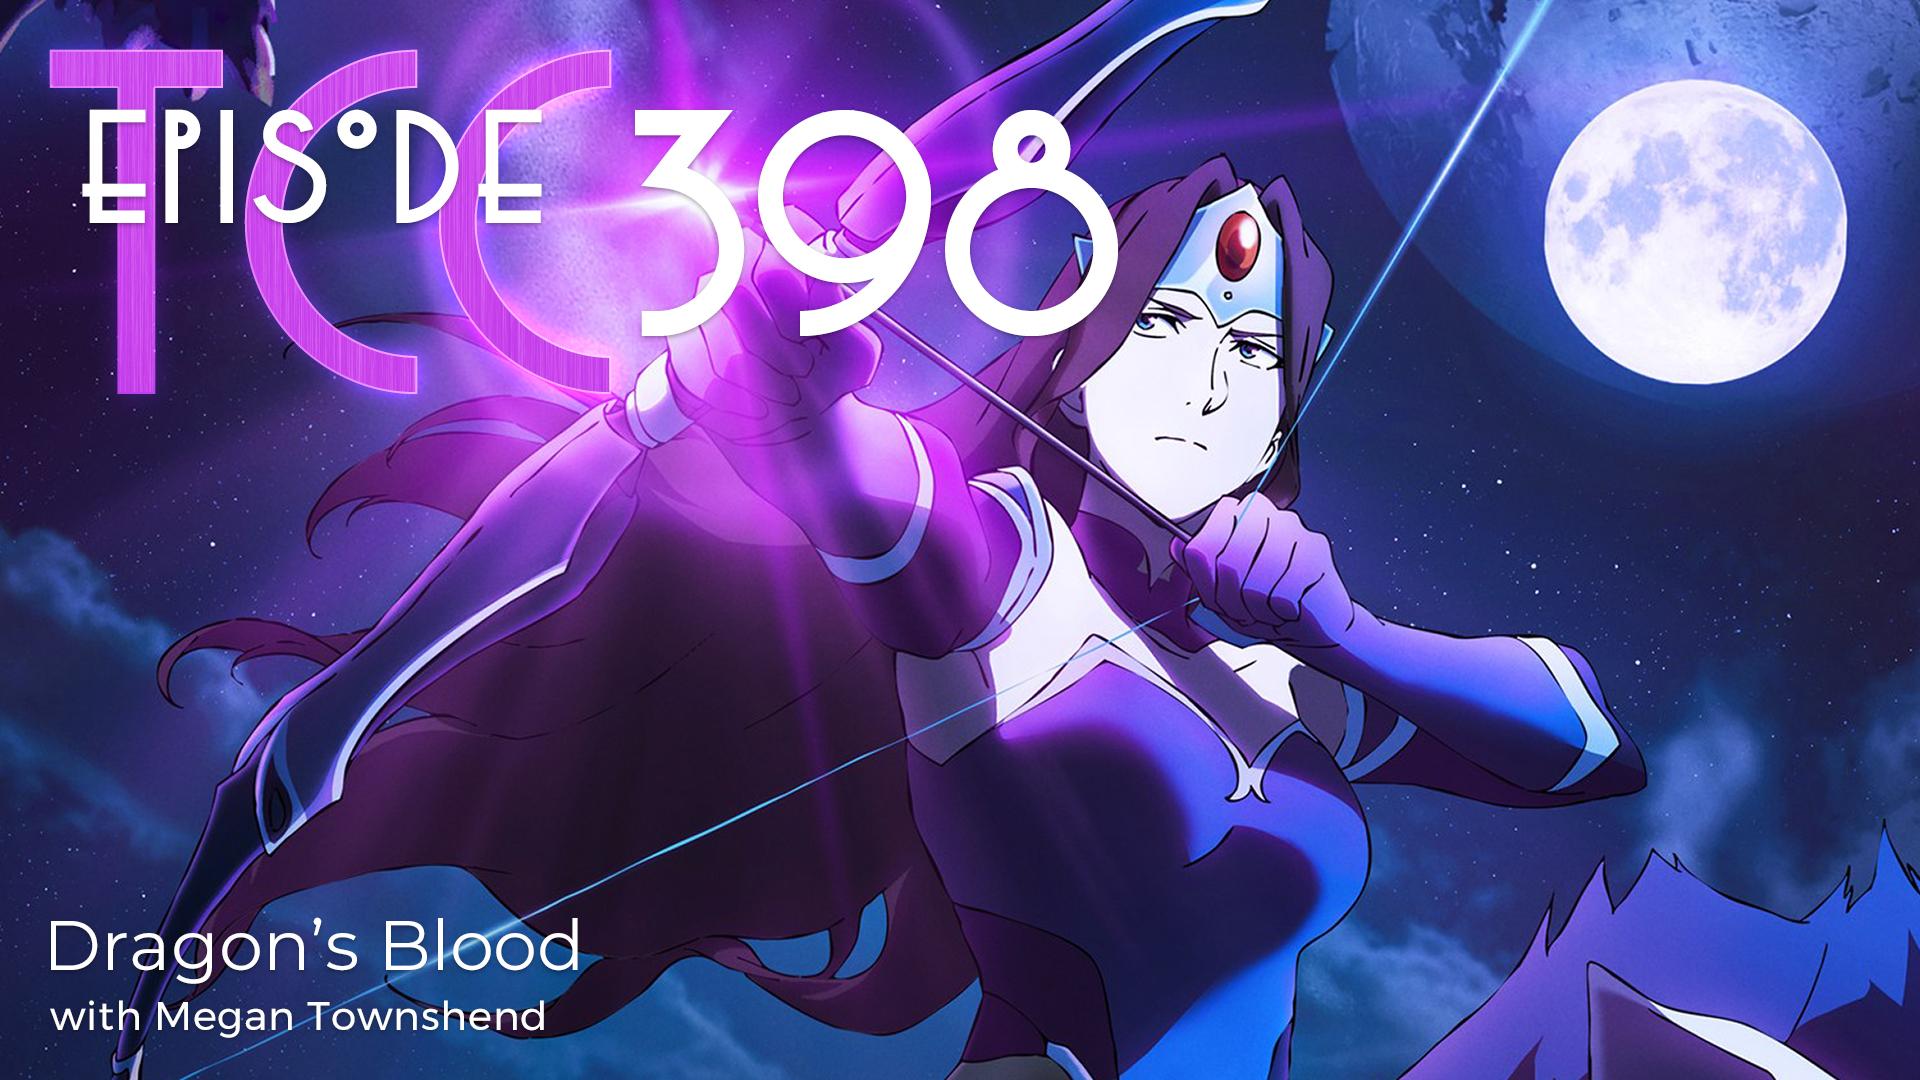 The Citadel Cafe 398: Dragon's Blood